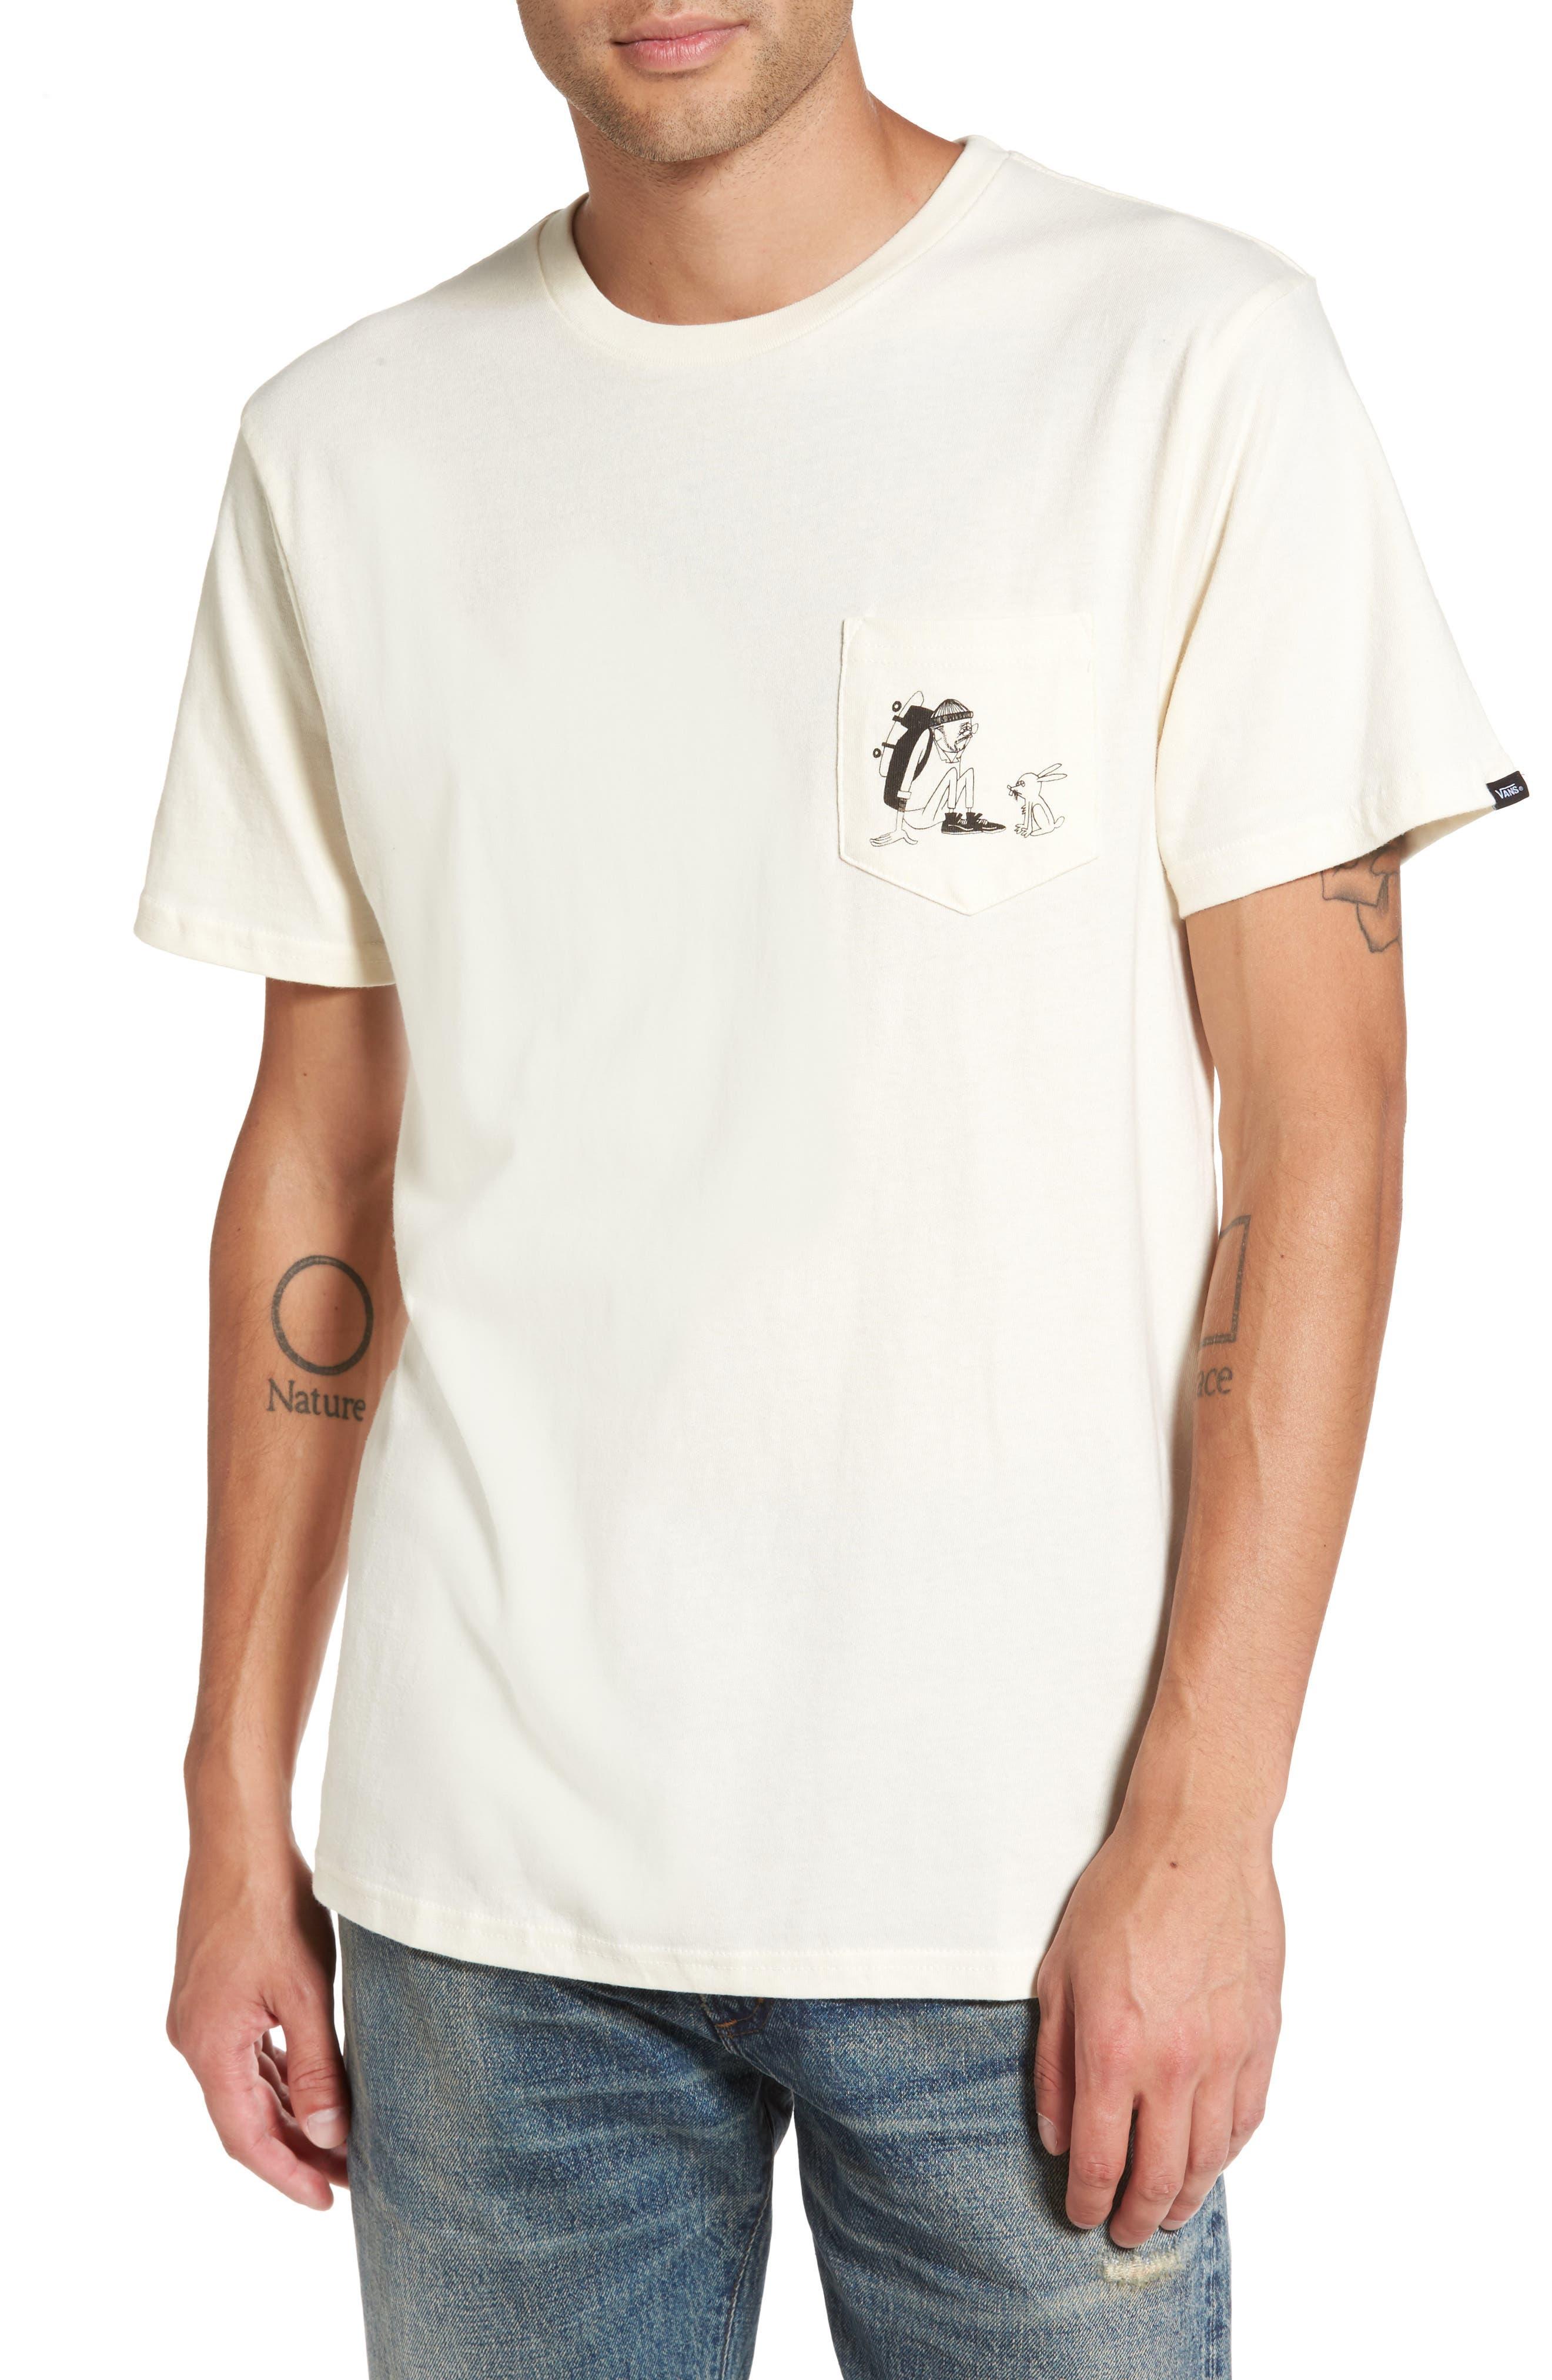 Main Image - Vans x Yusuke Hanai Outdoors Graphic Pocket T-Shirt